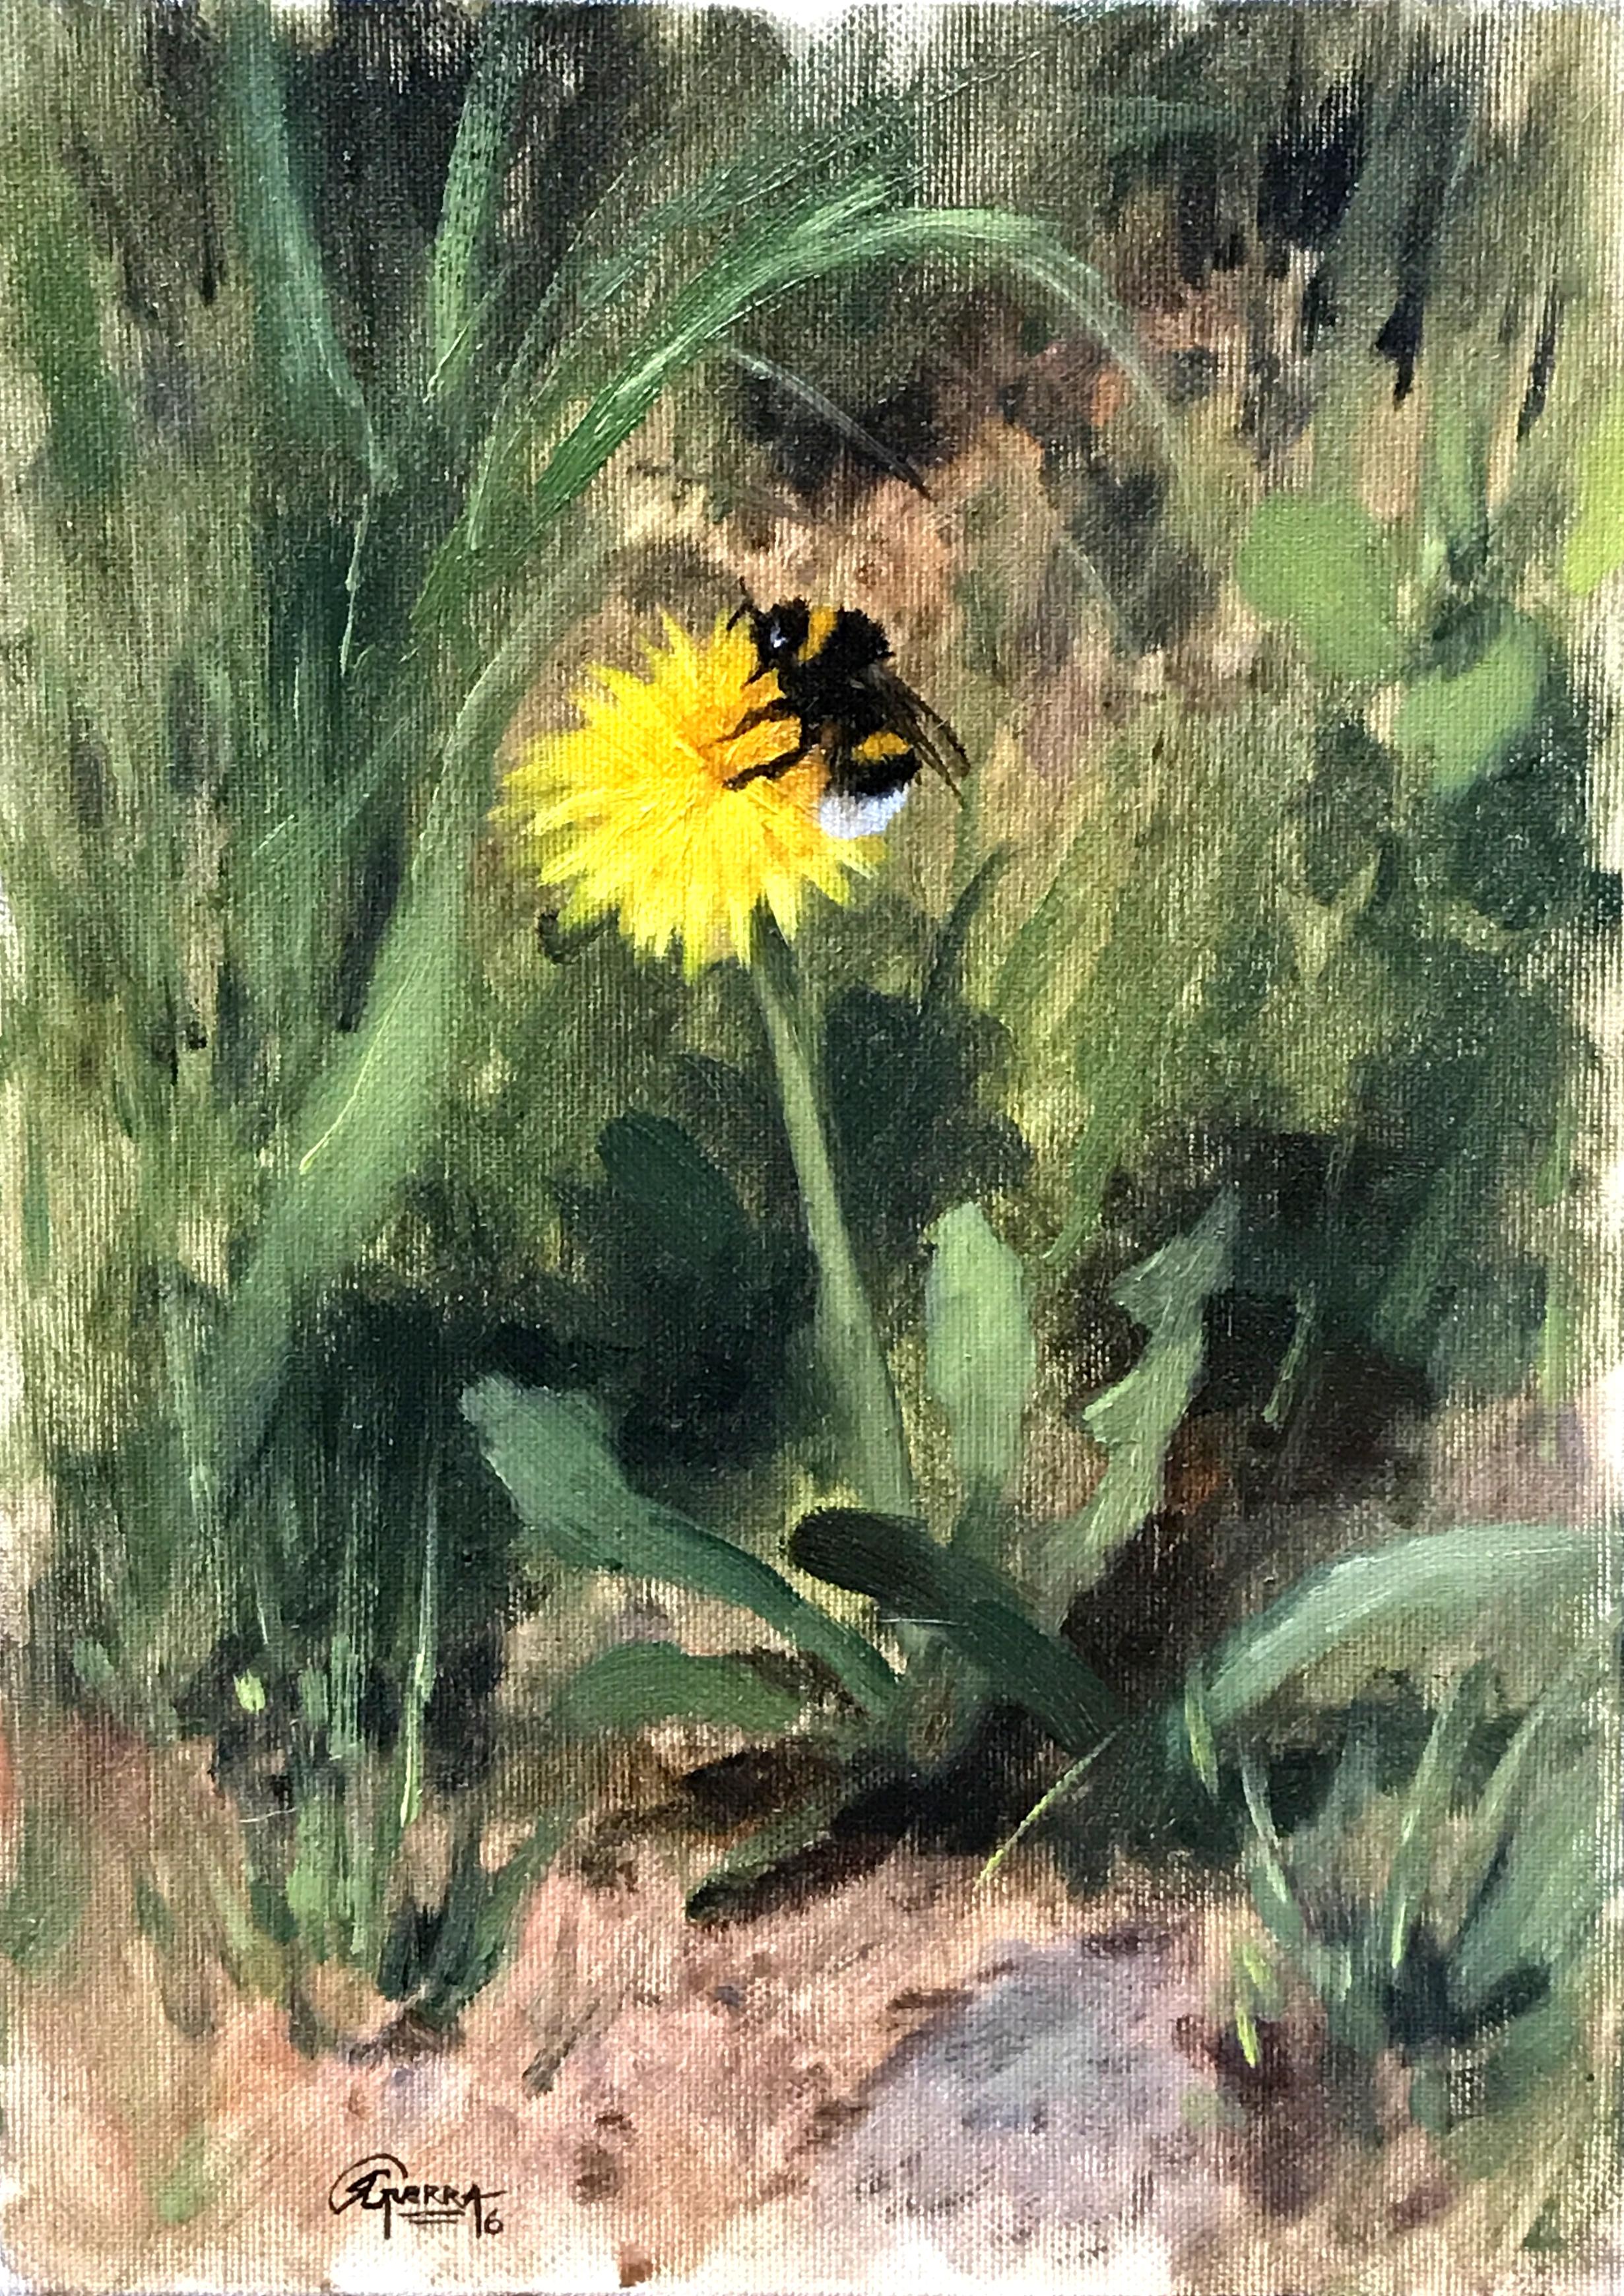 Dandelion and Bumblebee, Rafael Guerra